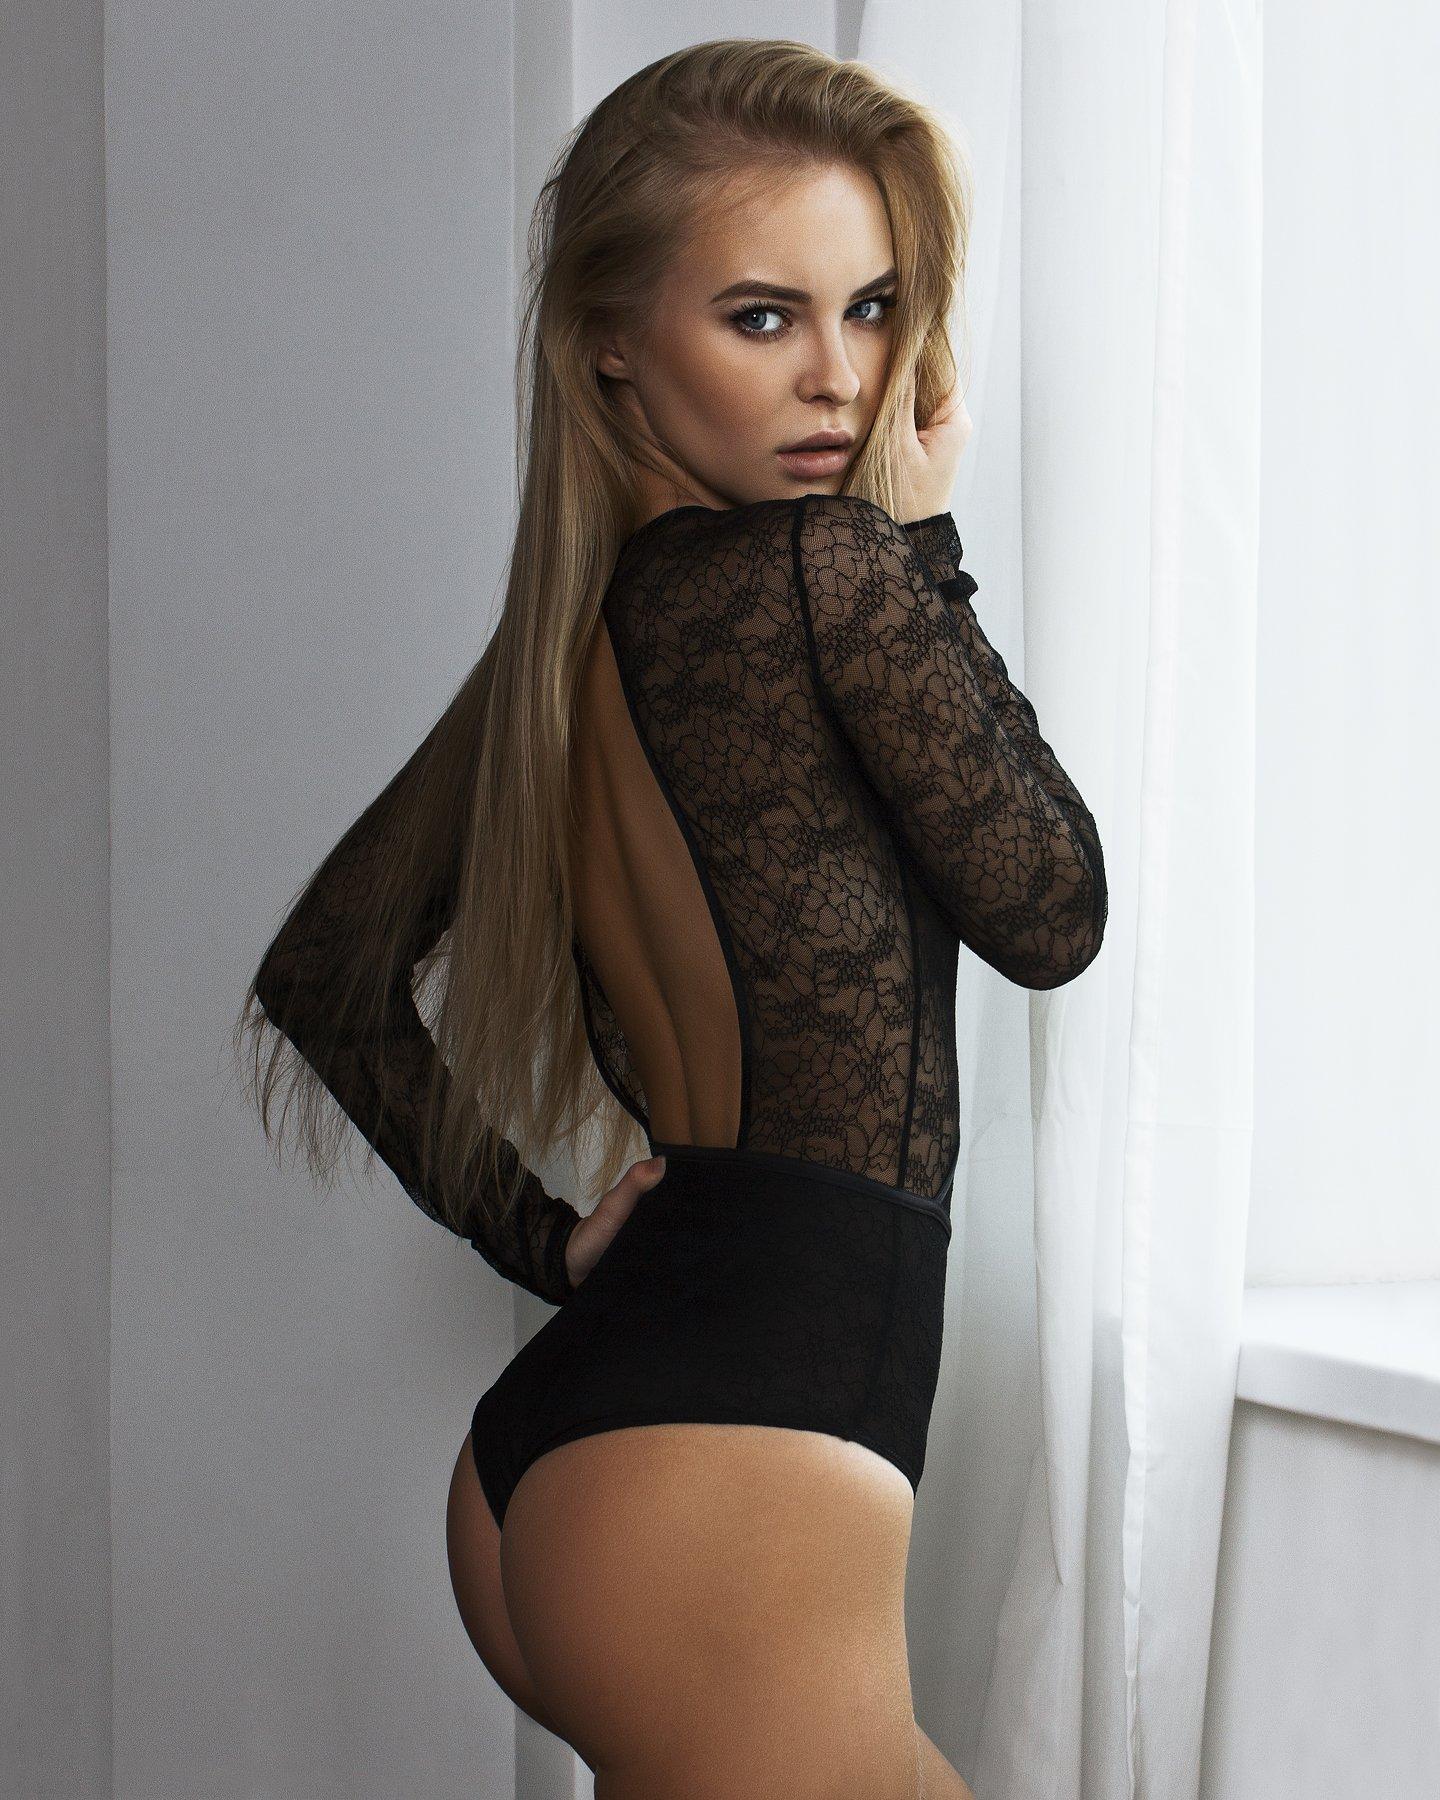 model, portrair, girl, art, арт, popular, sexy, zlobin awesome, Zlobin Awesome